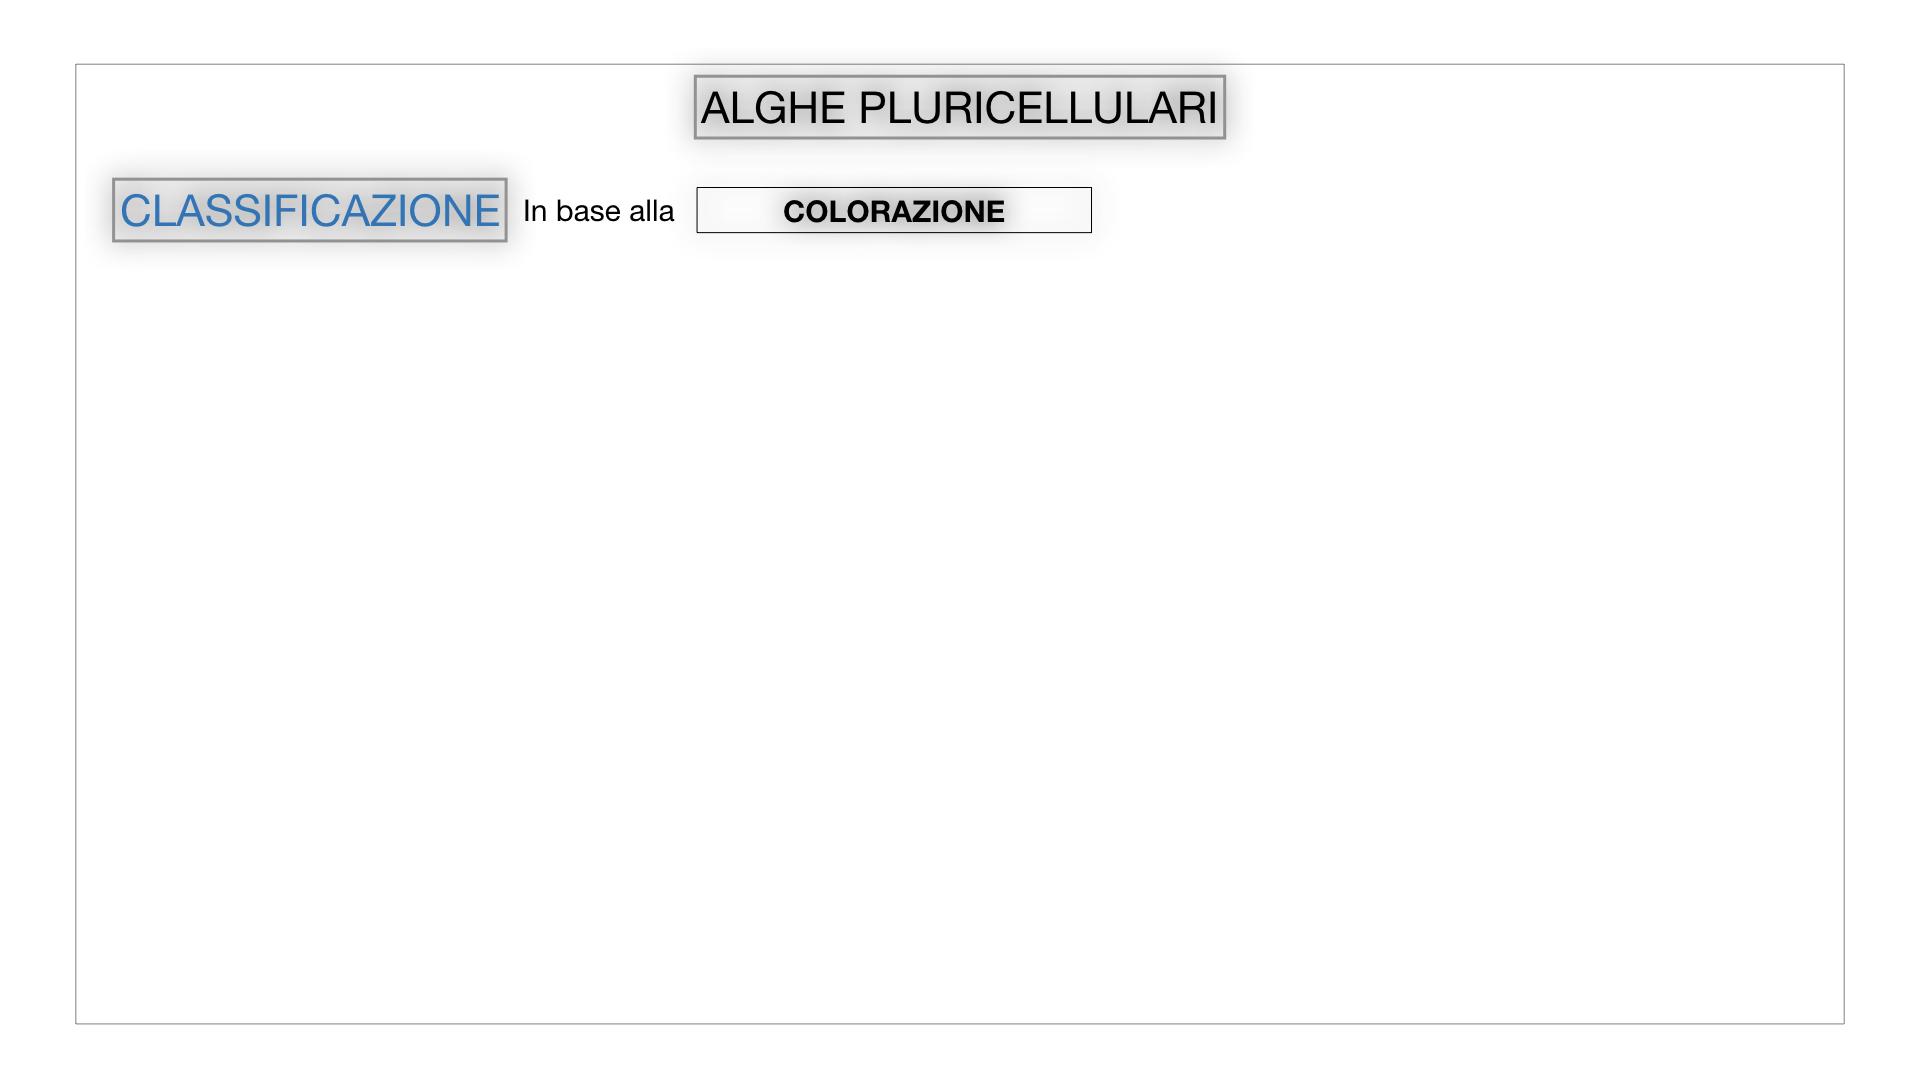 8. alghe uni_pluri_cellulari_SIMULAZIONE.043